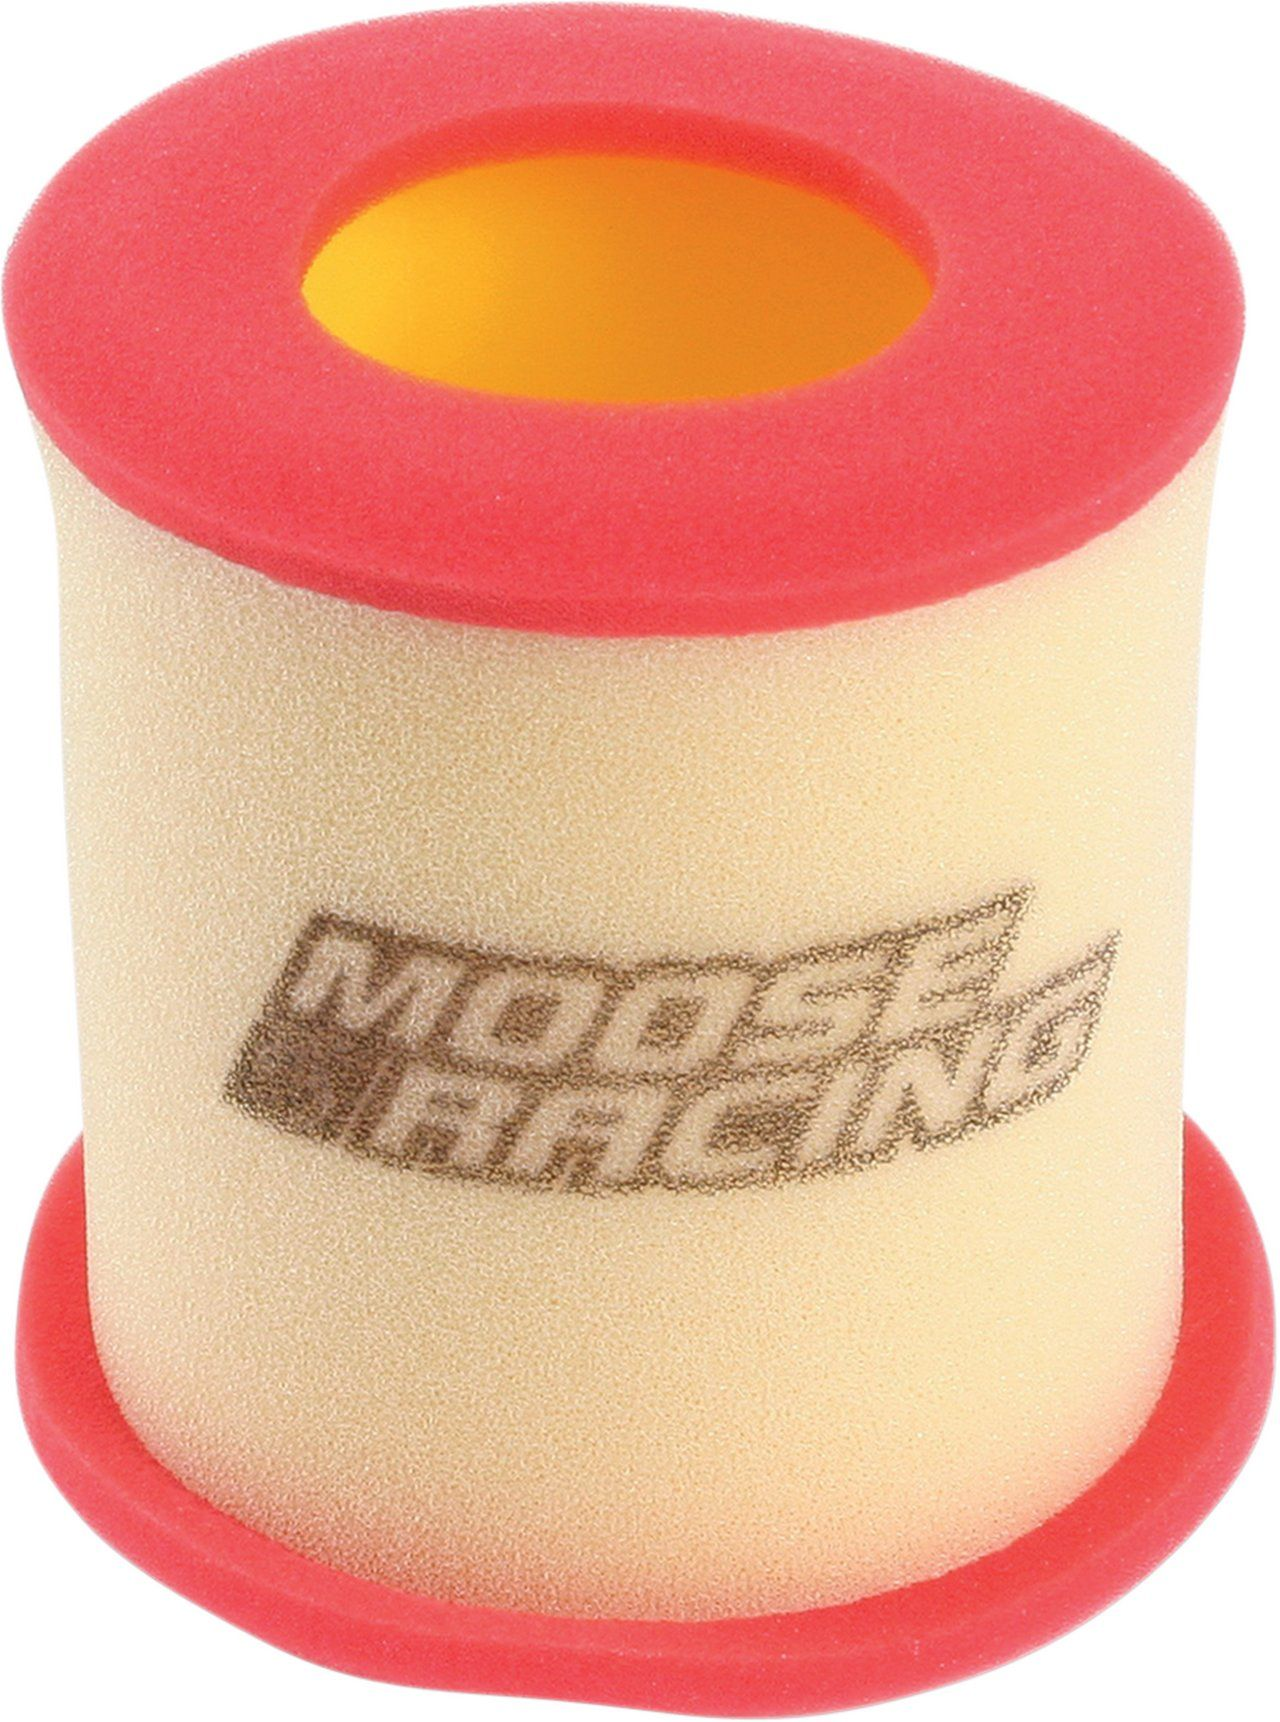 【MOOSE RACING】PPO (PRECISION PRE-OILED) 空氣濾芯 [1011-0562] - 「Webike-摩托百貨」